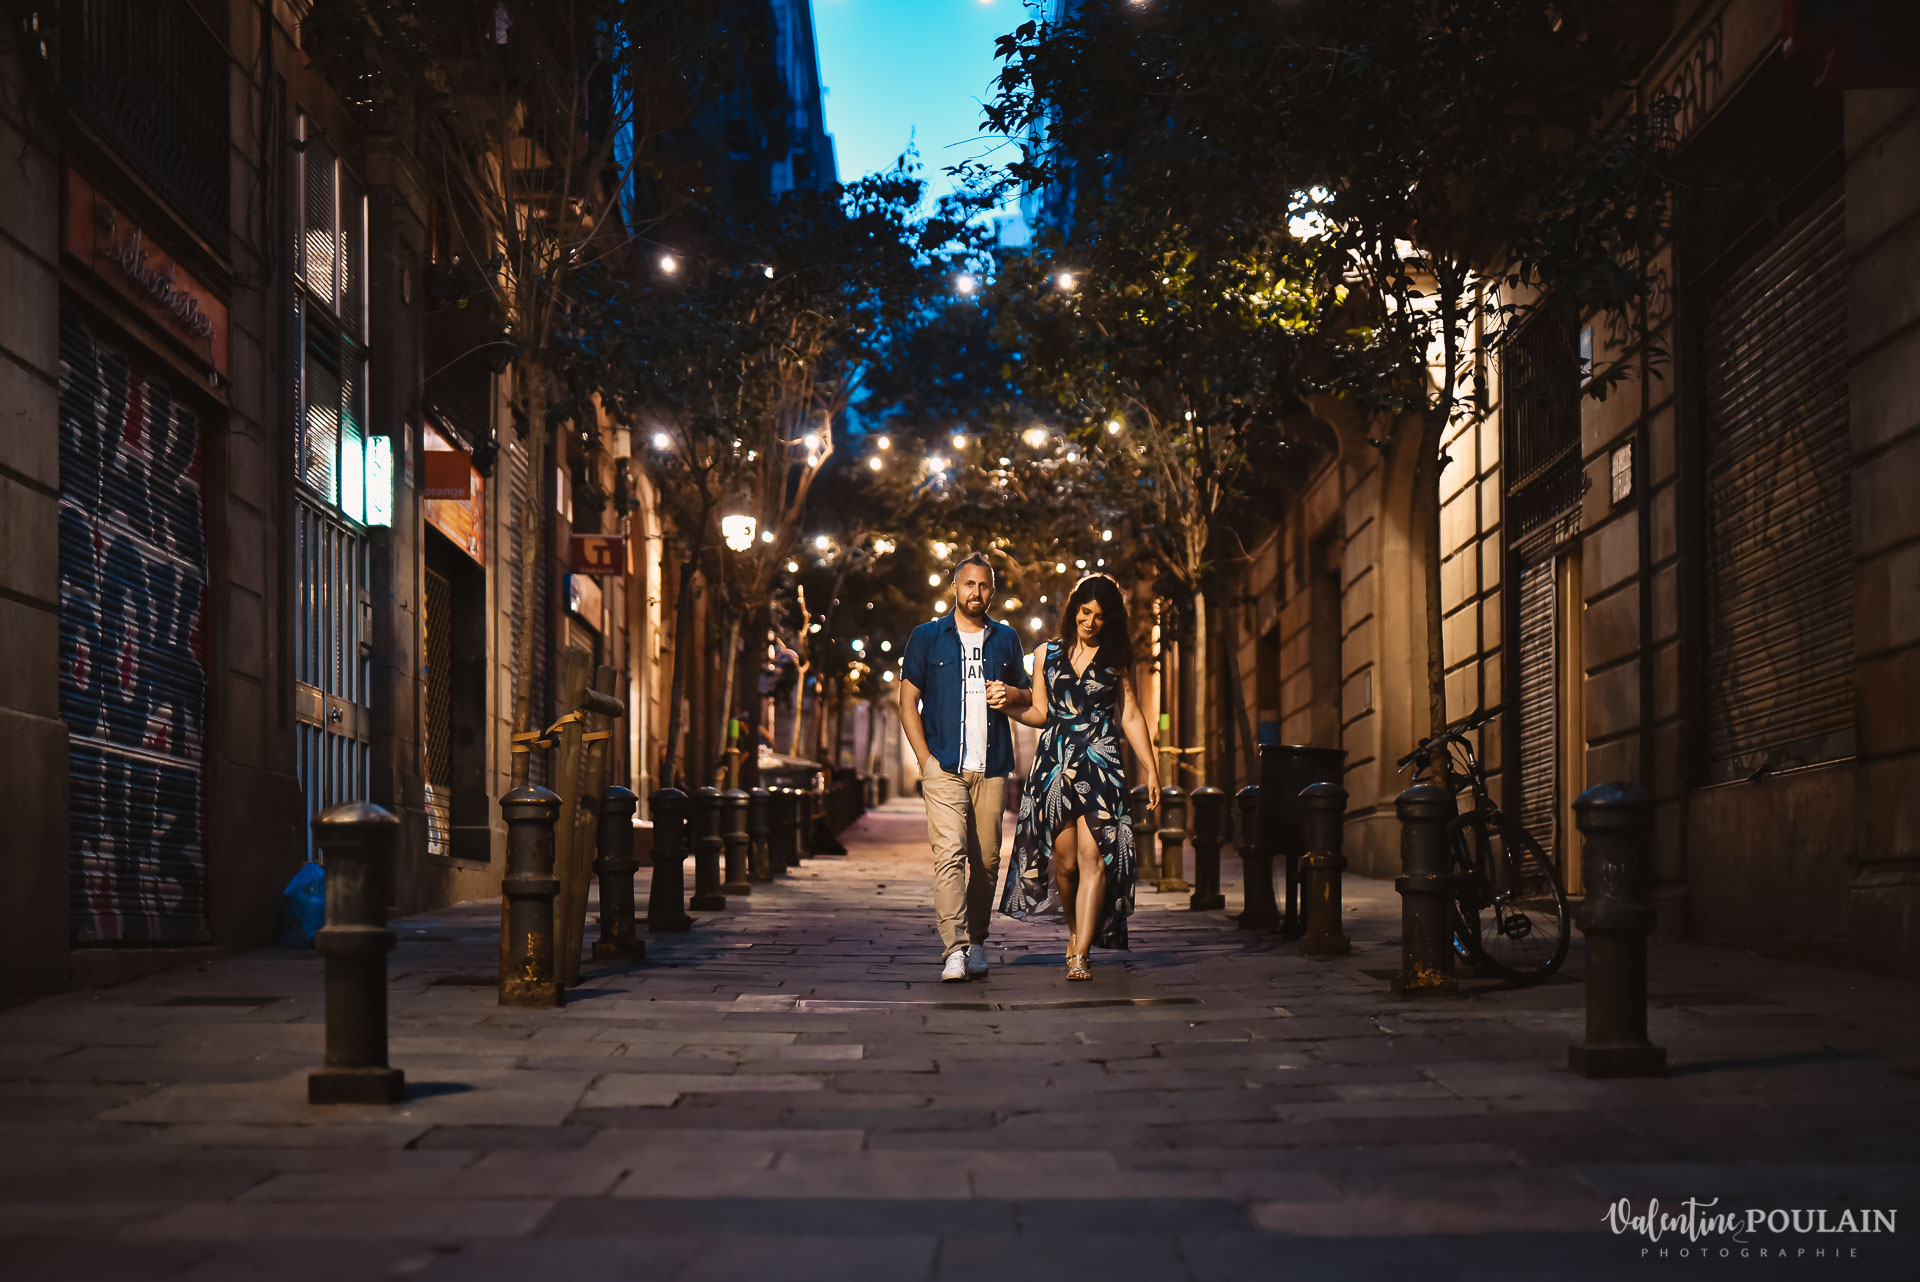 Séance photo couple Barcelone - Valentine Poulain night city